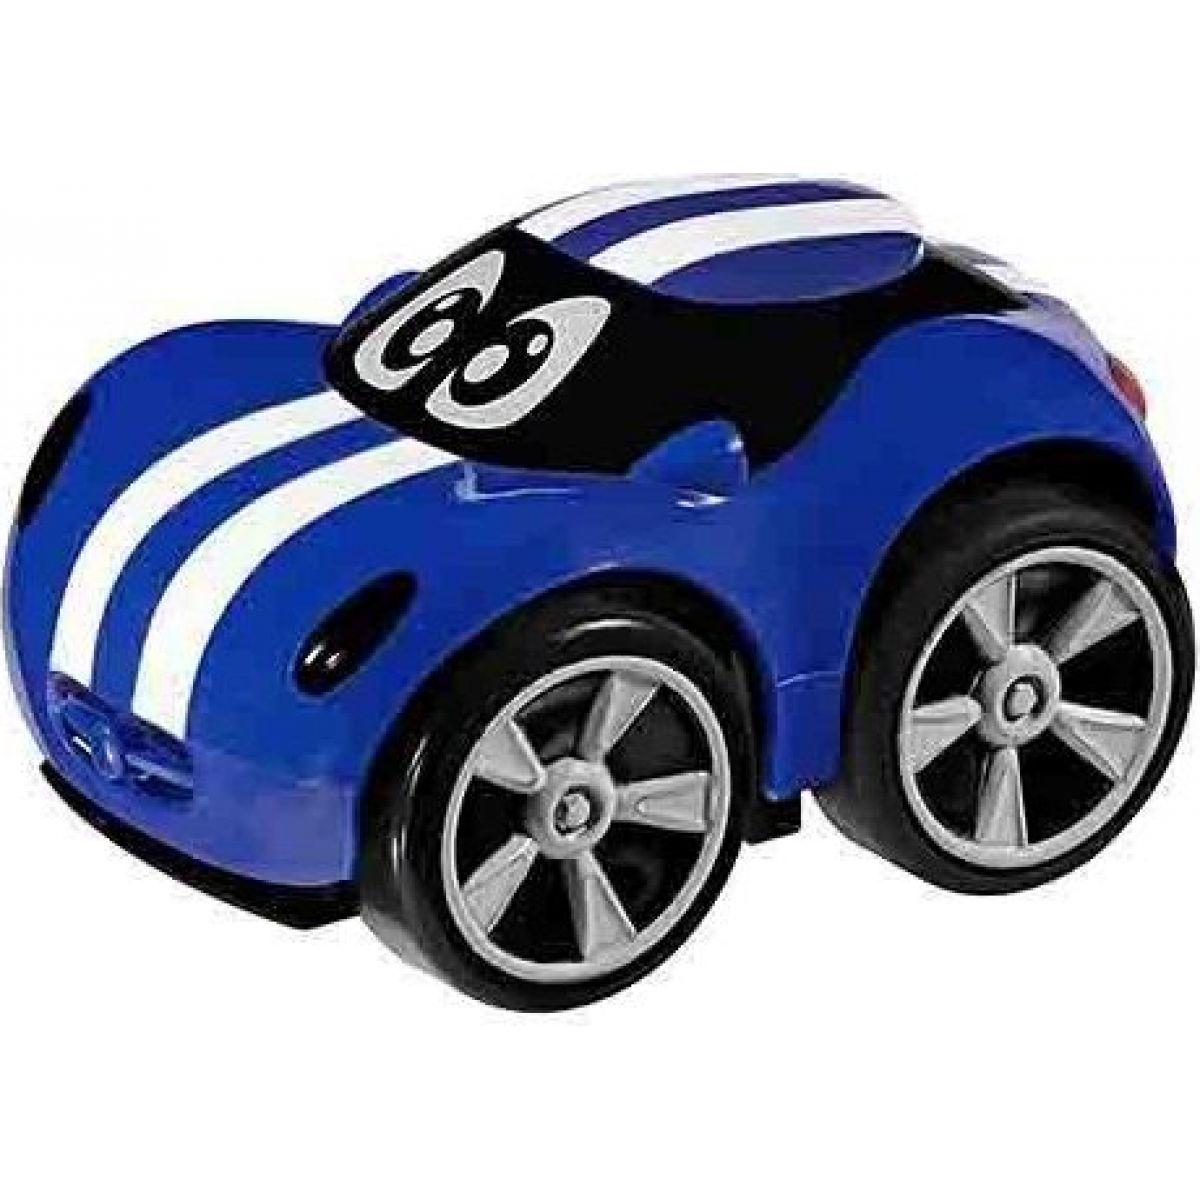 Chicco autíčko kaskadér Dony modré